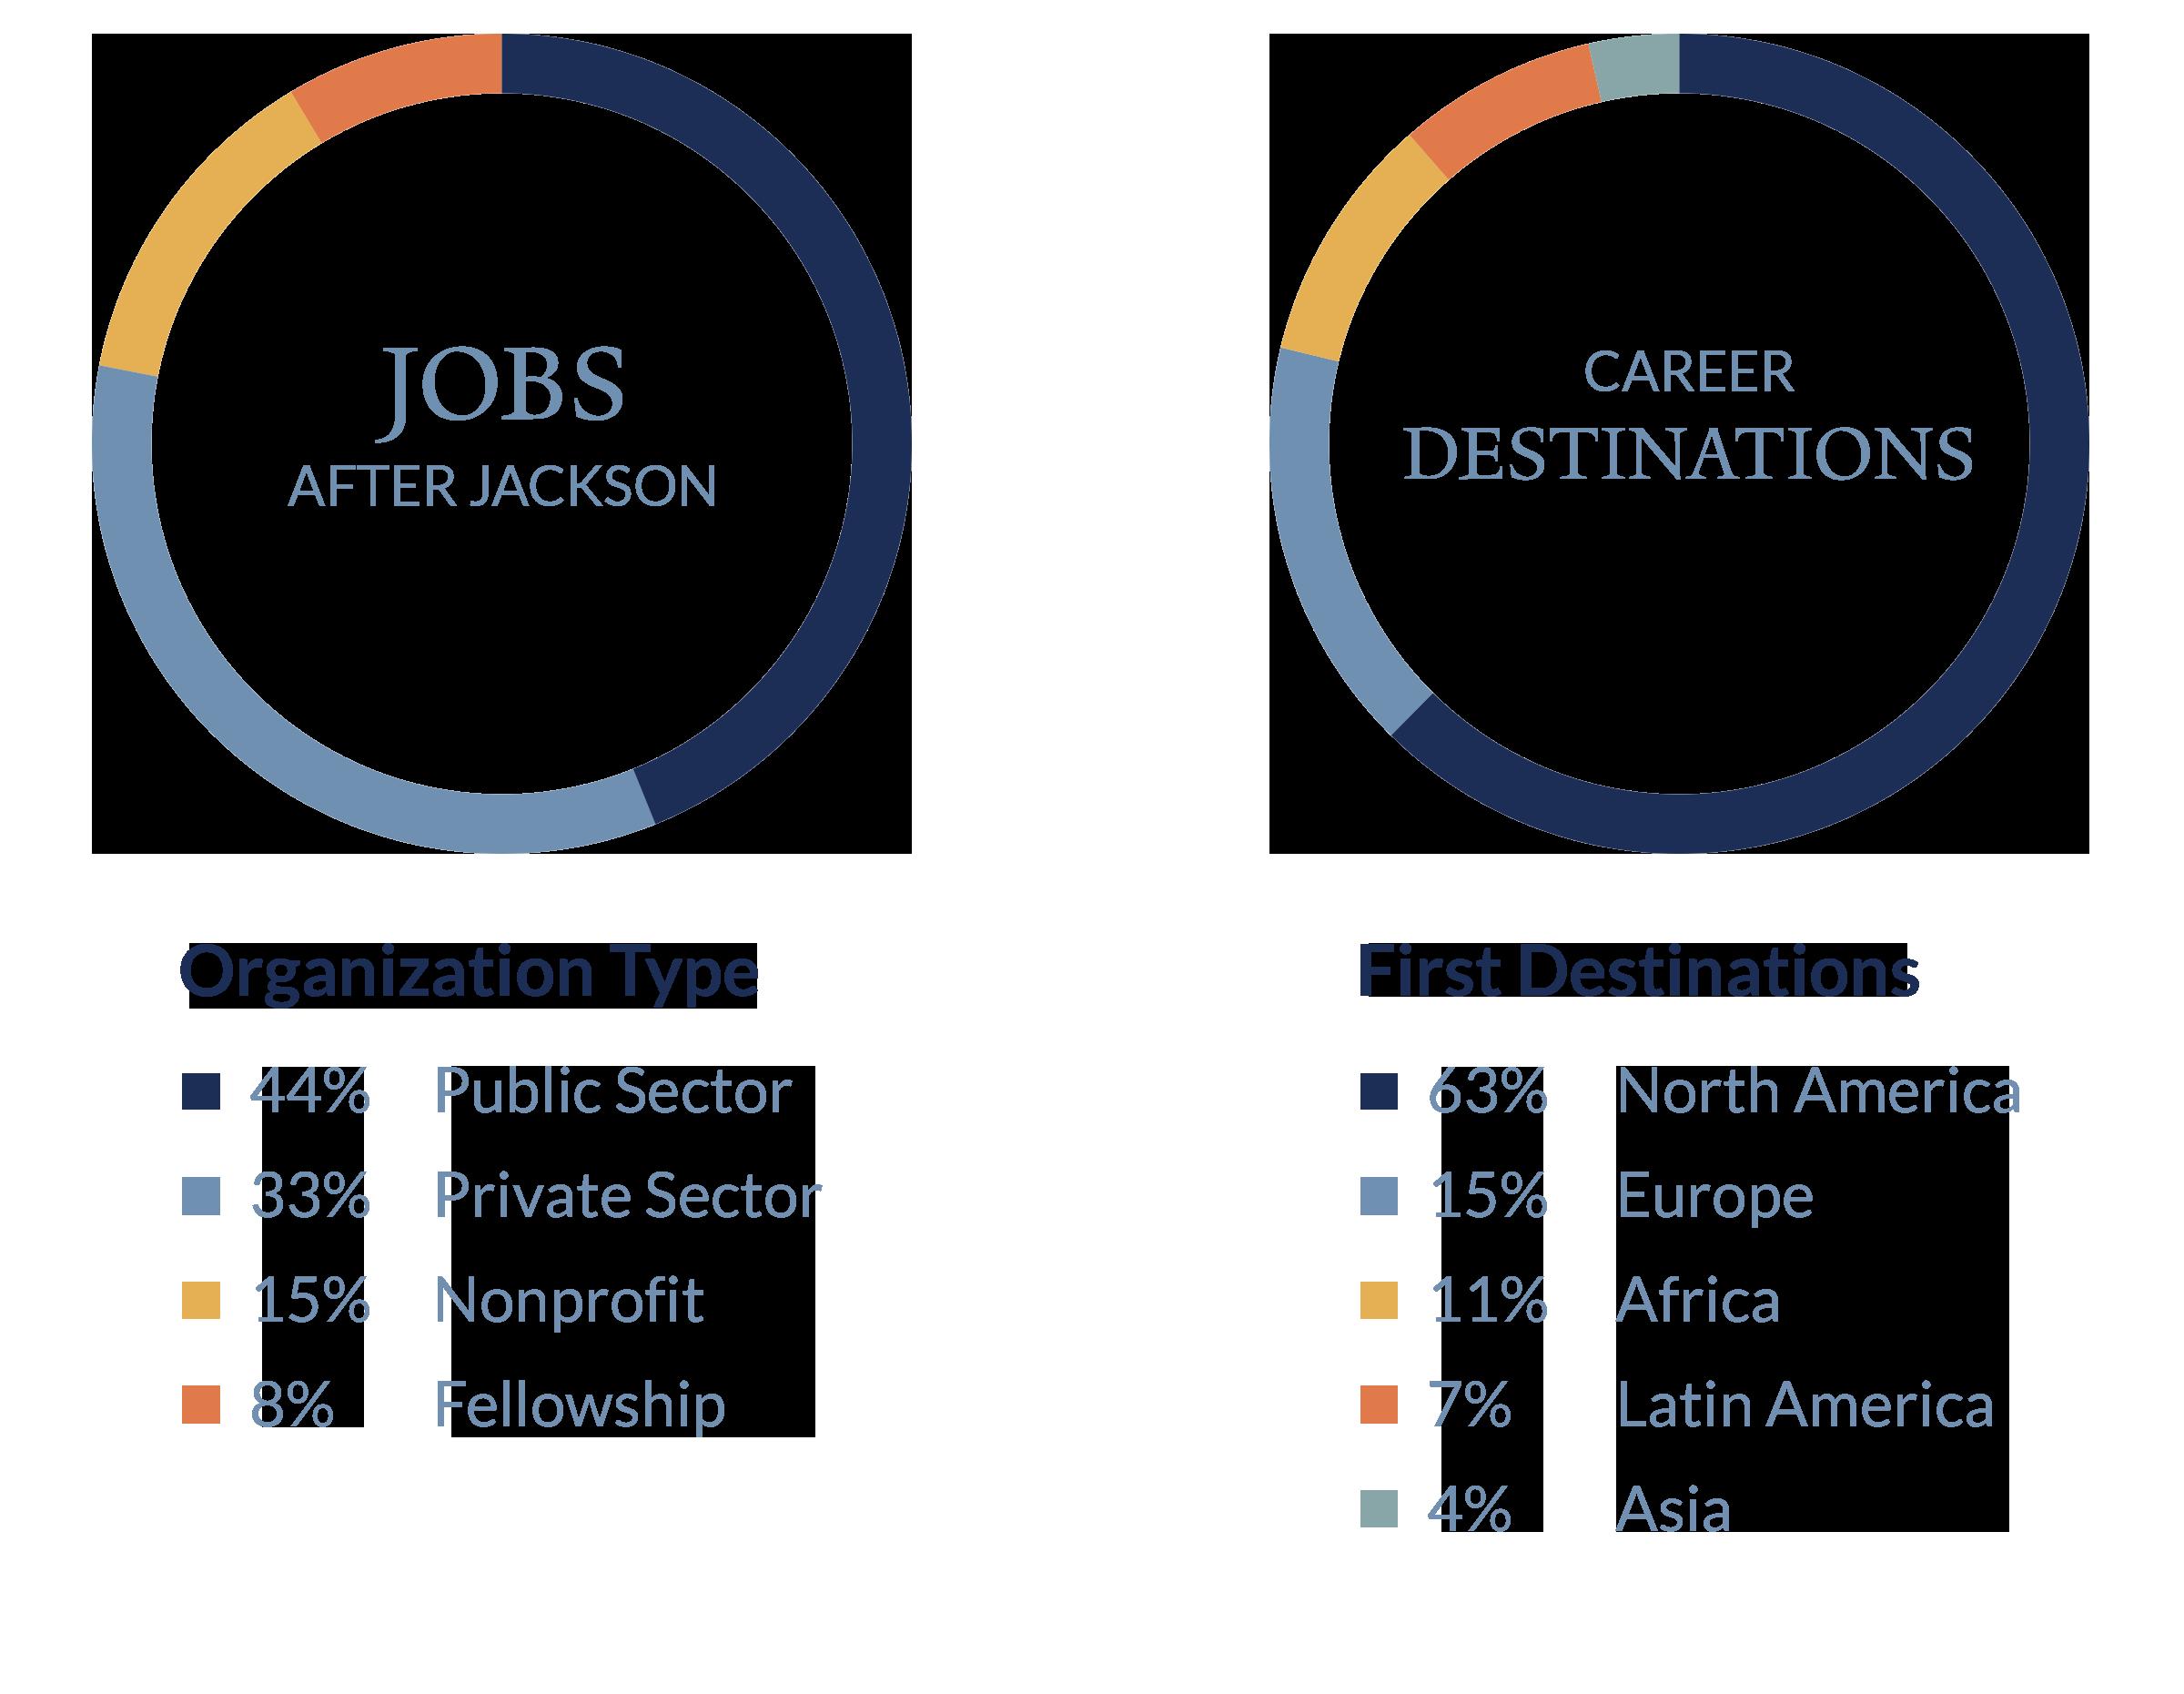 Jobs After Jackson Figures